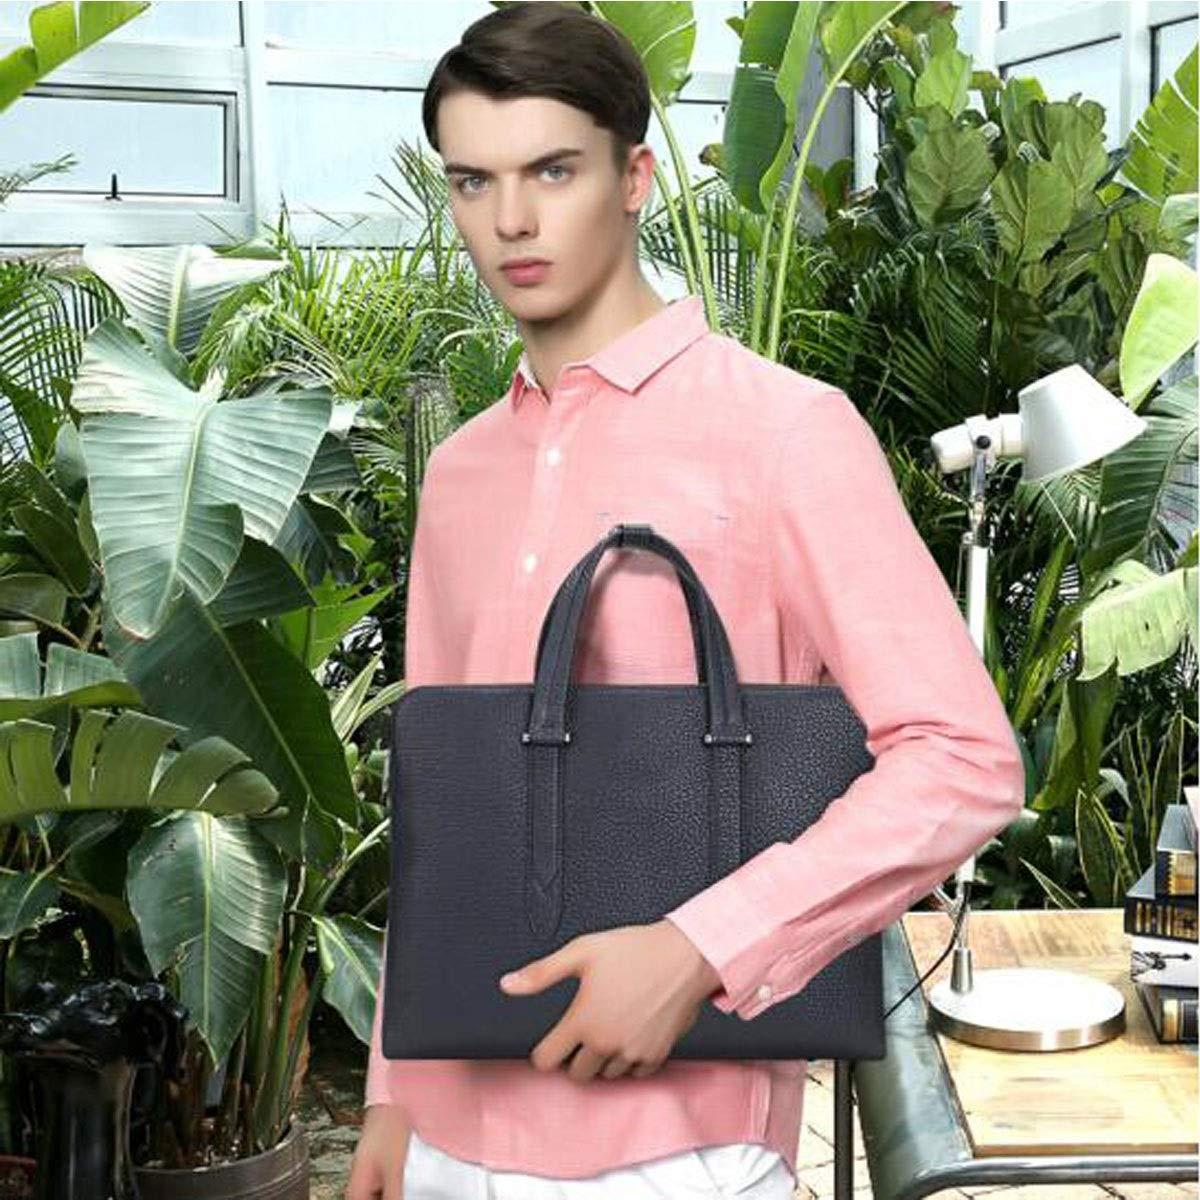 Leather Tote 8haowenju Briefcase Color : Blue Blue Size: 37629cm Fashion Business Bag